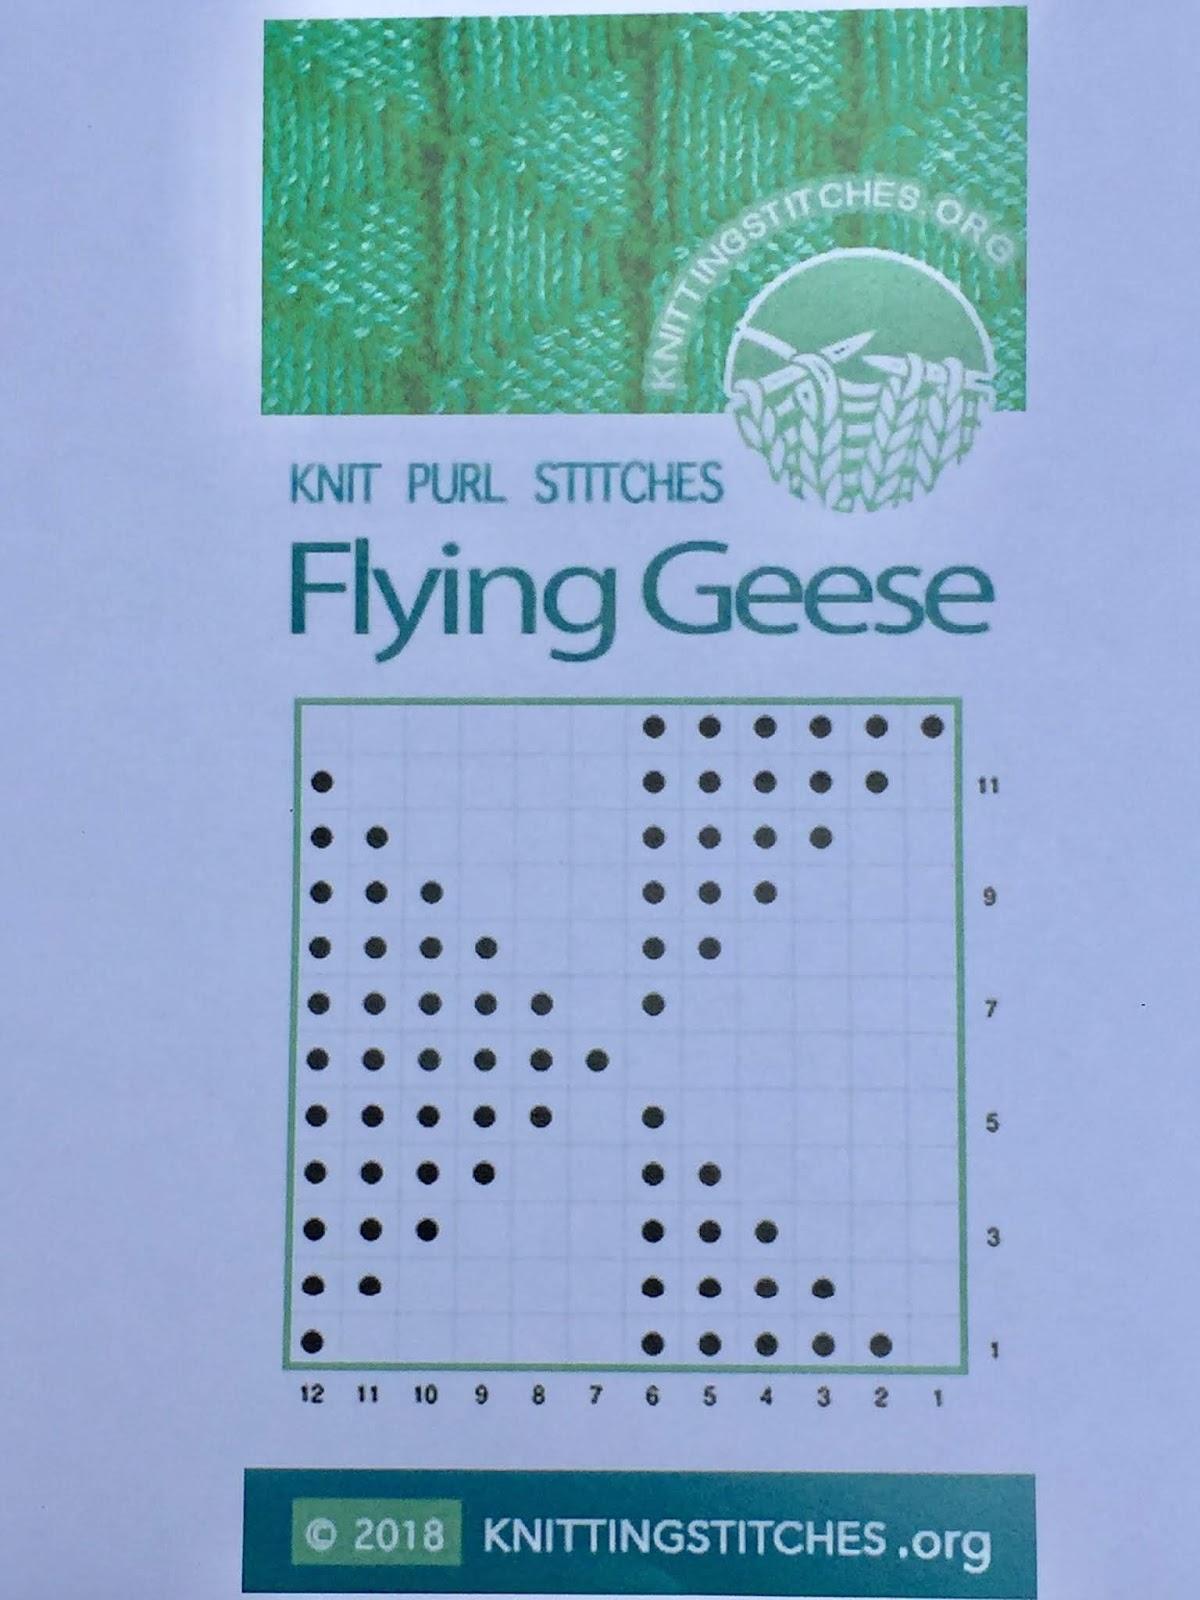 Knitting Stitches 2018 - Flying Geese stitch pattern